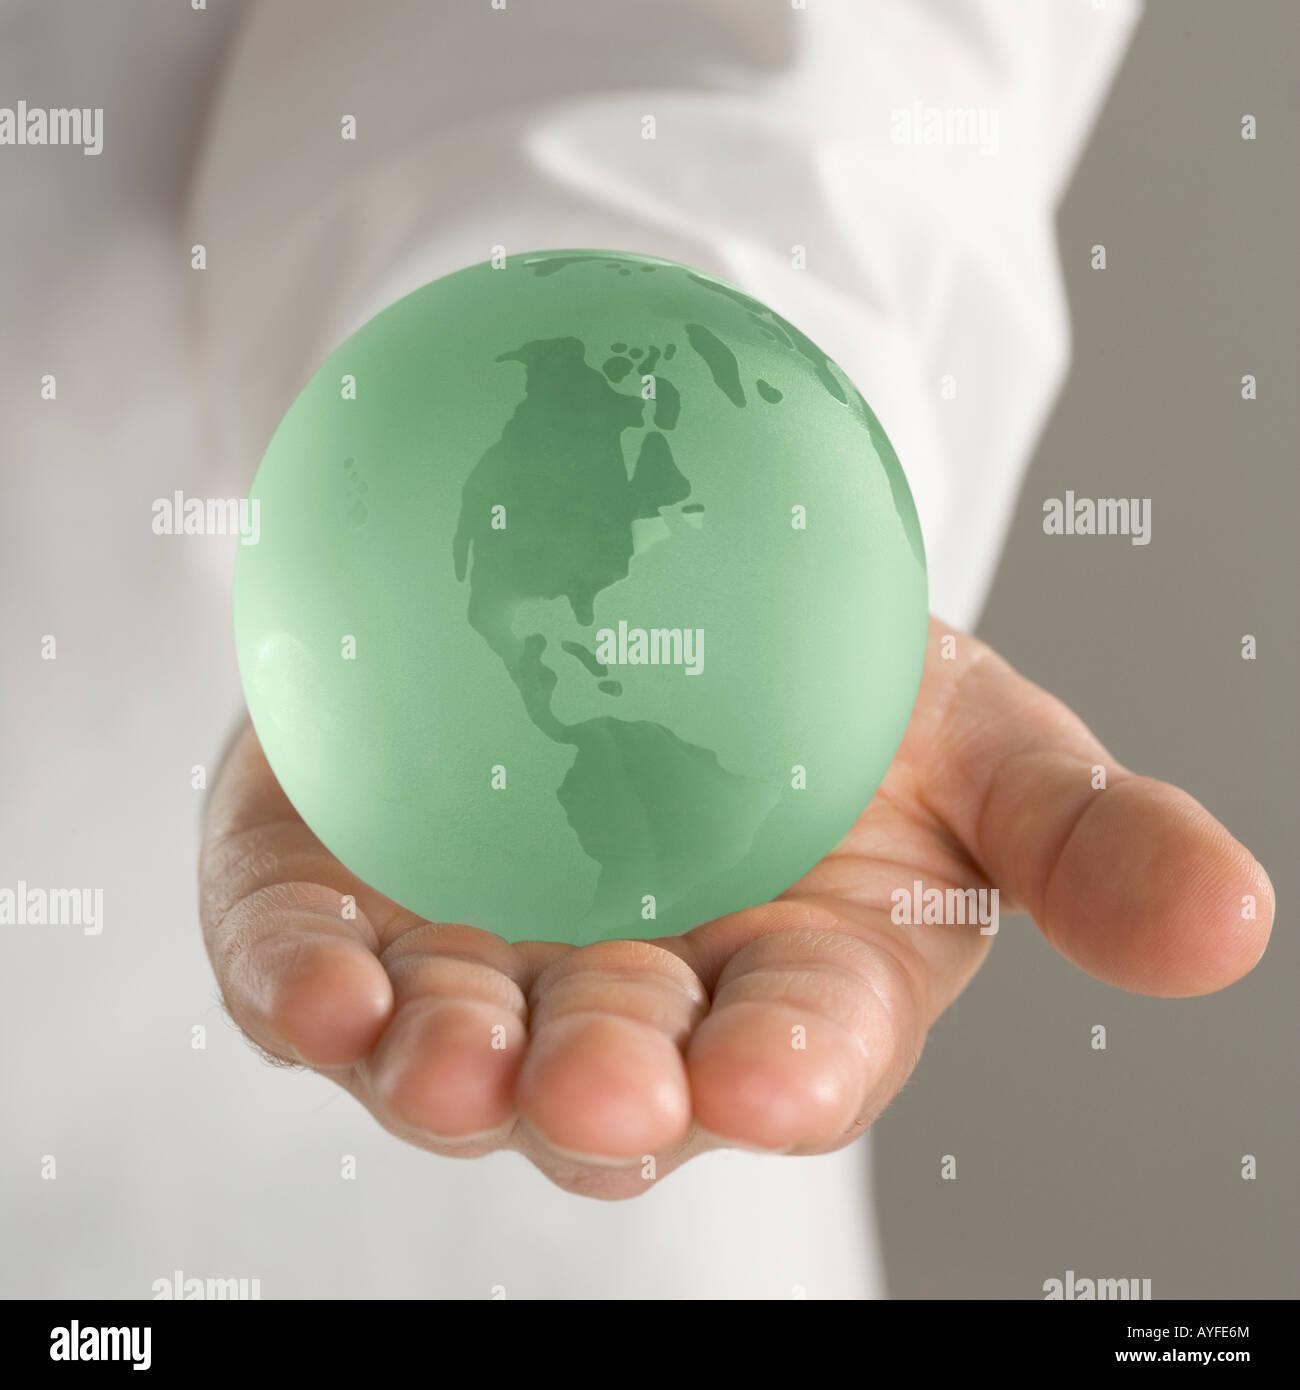 Mano sosteniendo globo Foto de stock